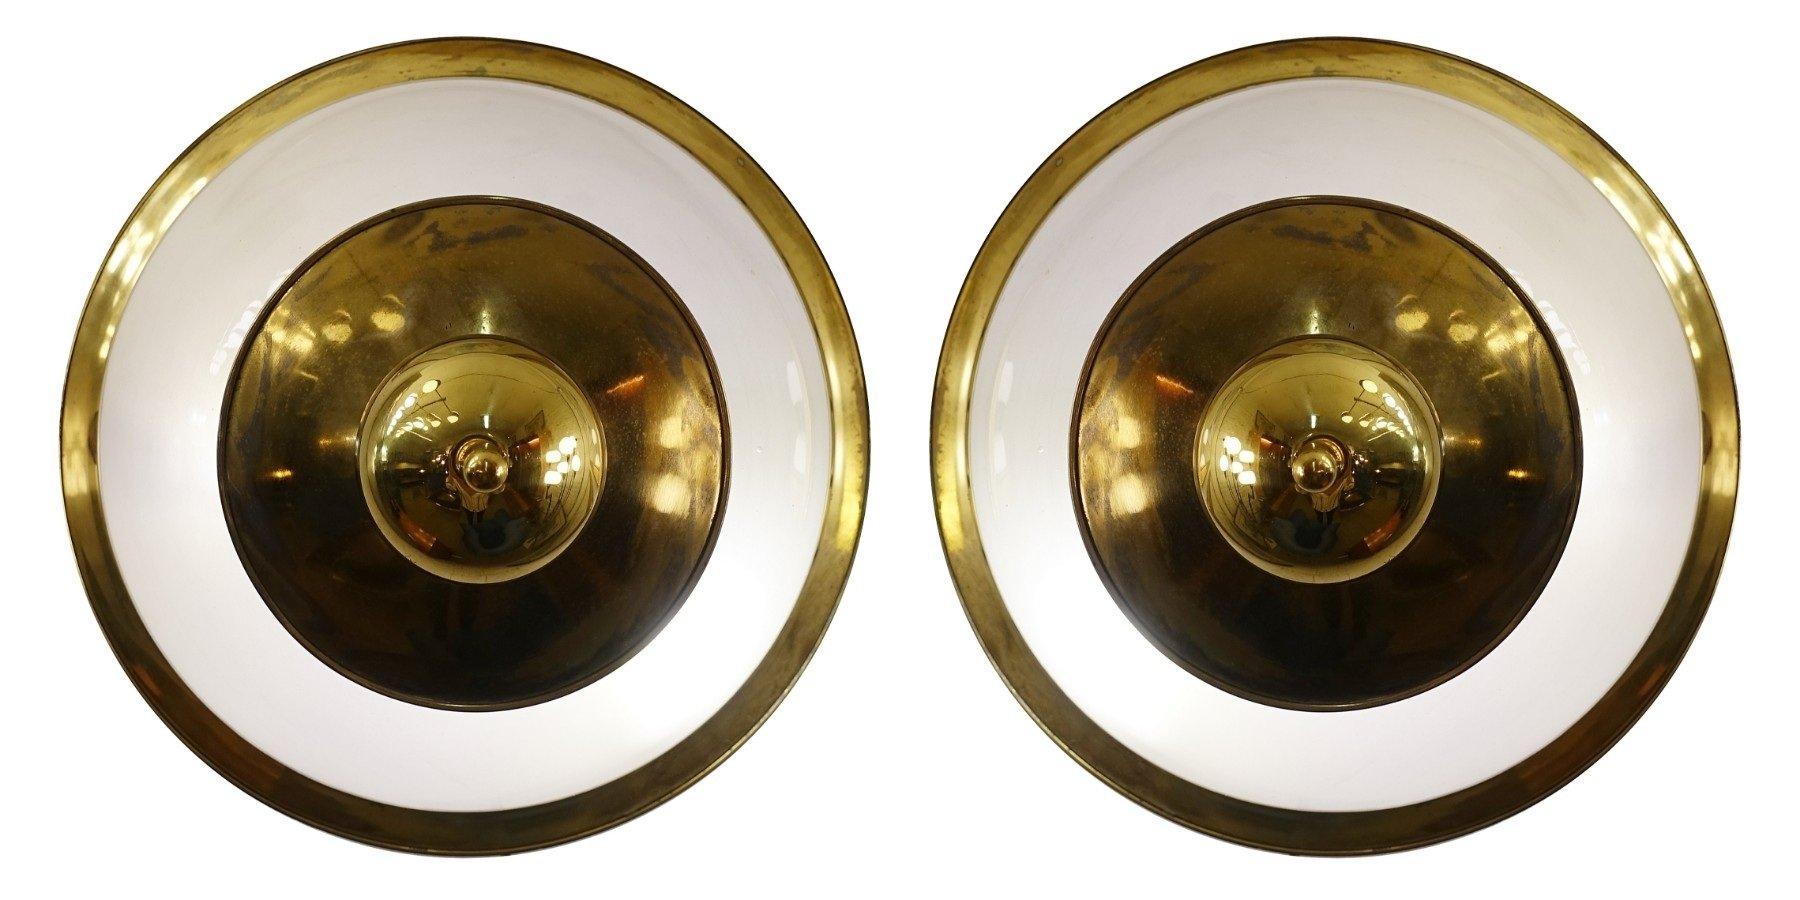 Vintage Lampen aus Messing & Milchglas von Luigi Caccia Dominioni für ...